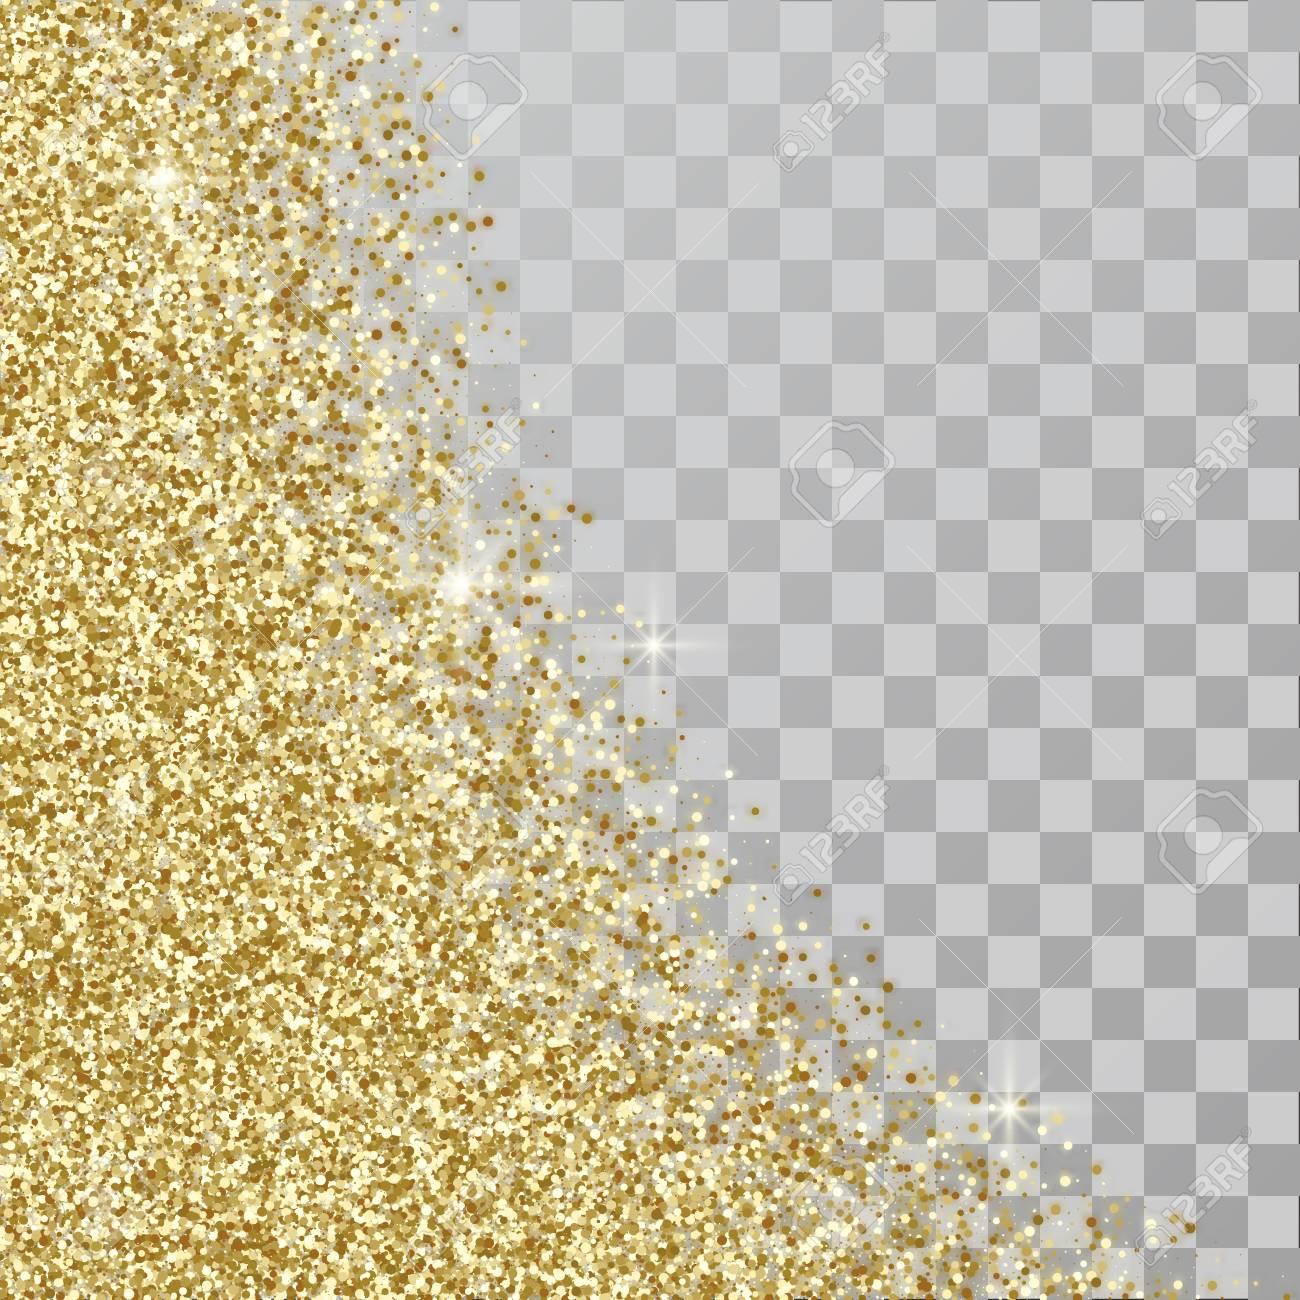 gold glitter abstract background golden sparkles on transpsrent